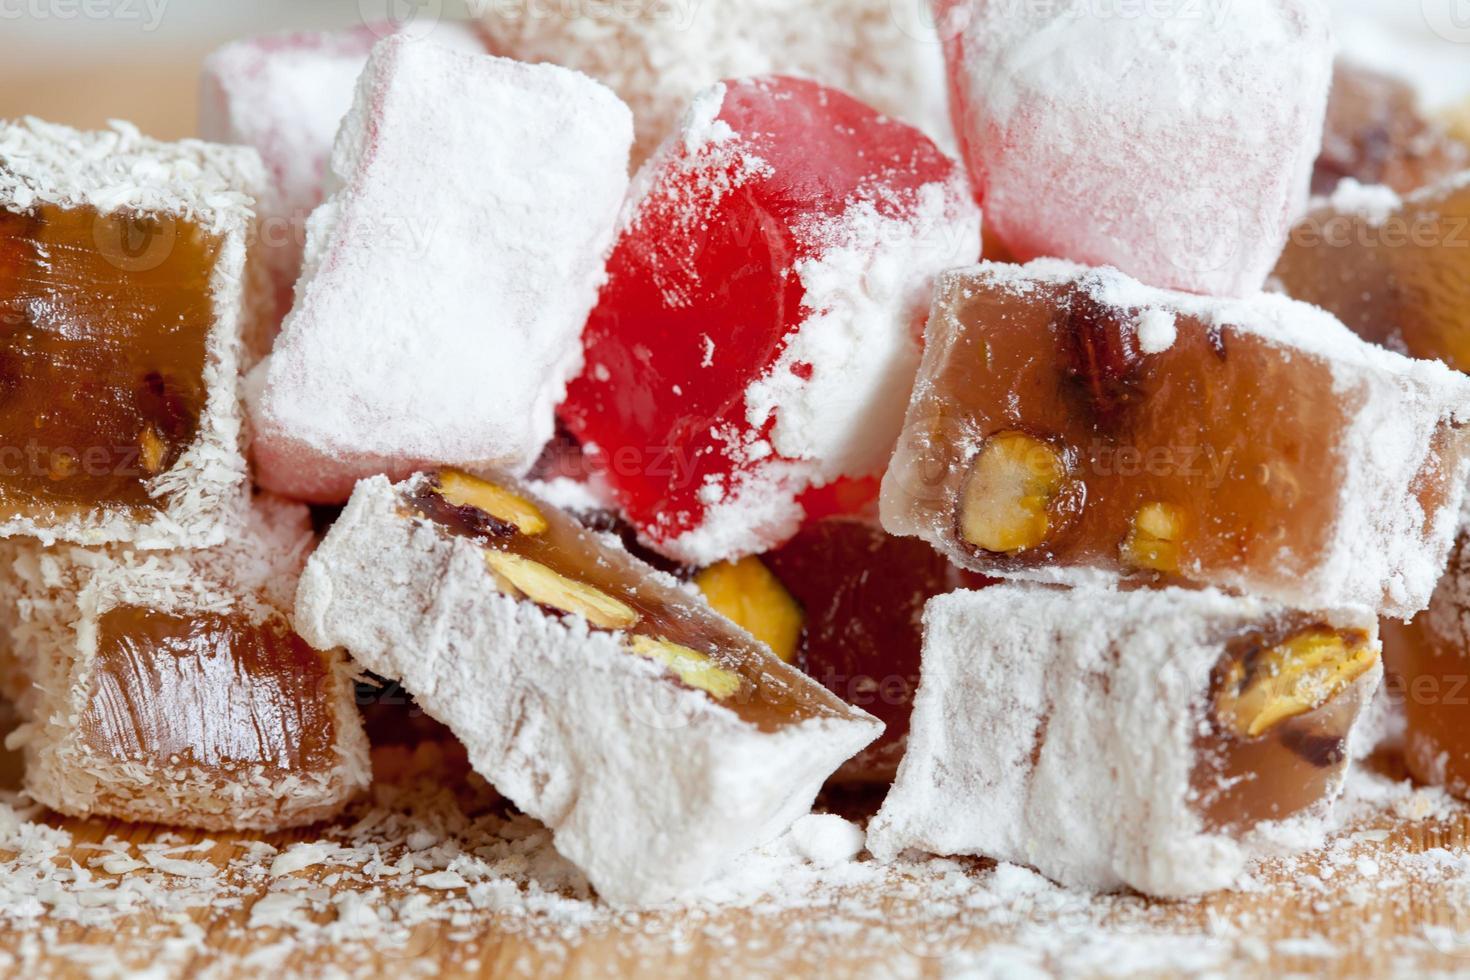 dessert. bonbons turcs, arabes. photo